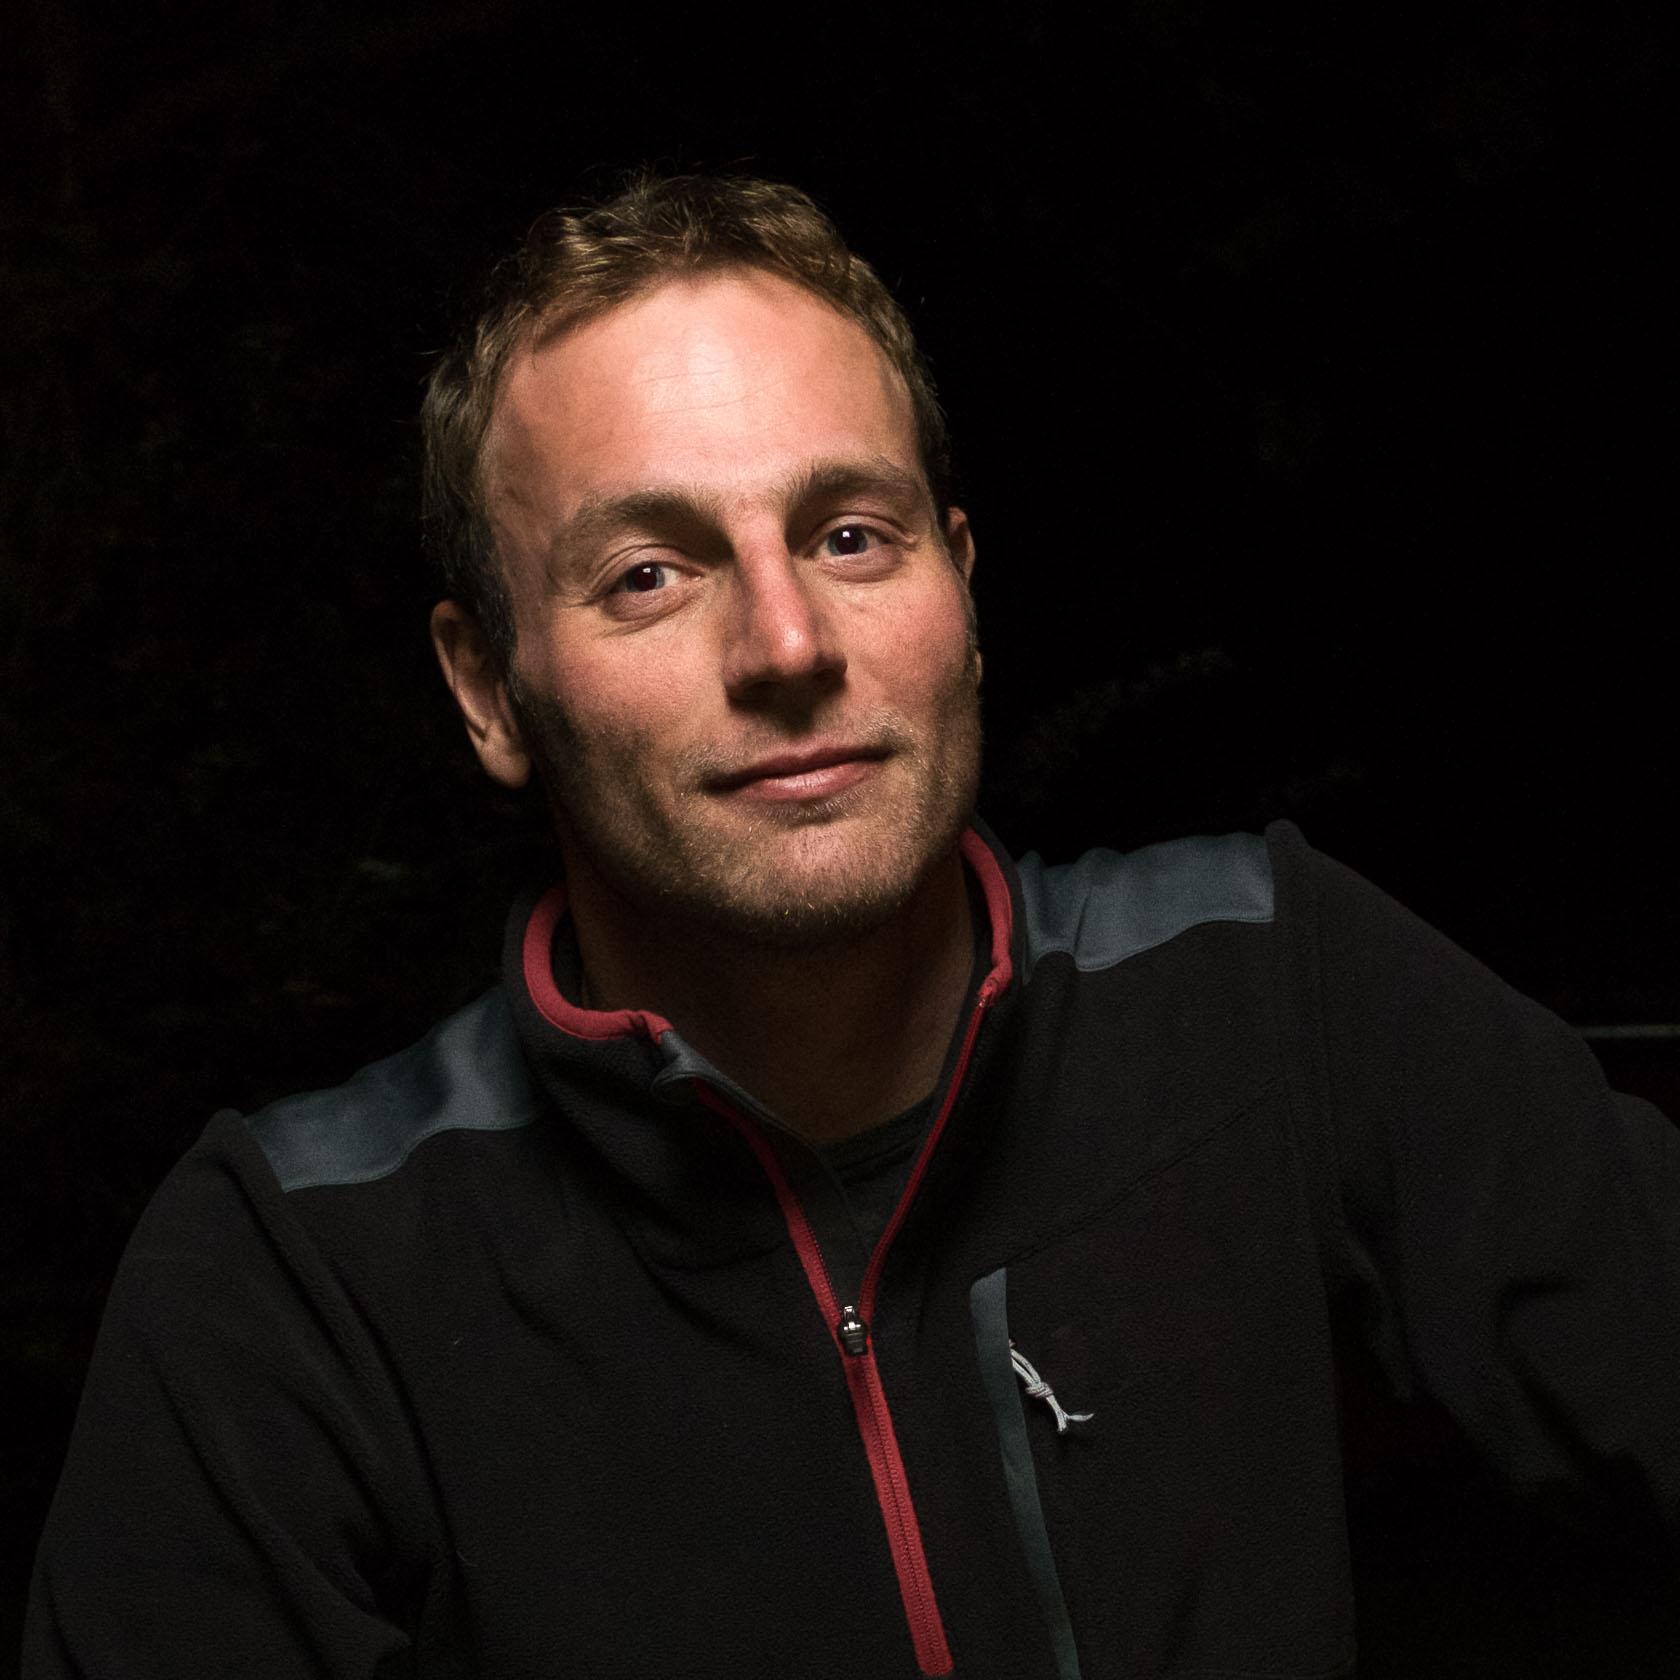 Porträt Martin Leonhardt 2016